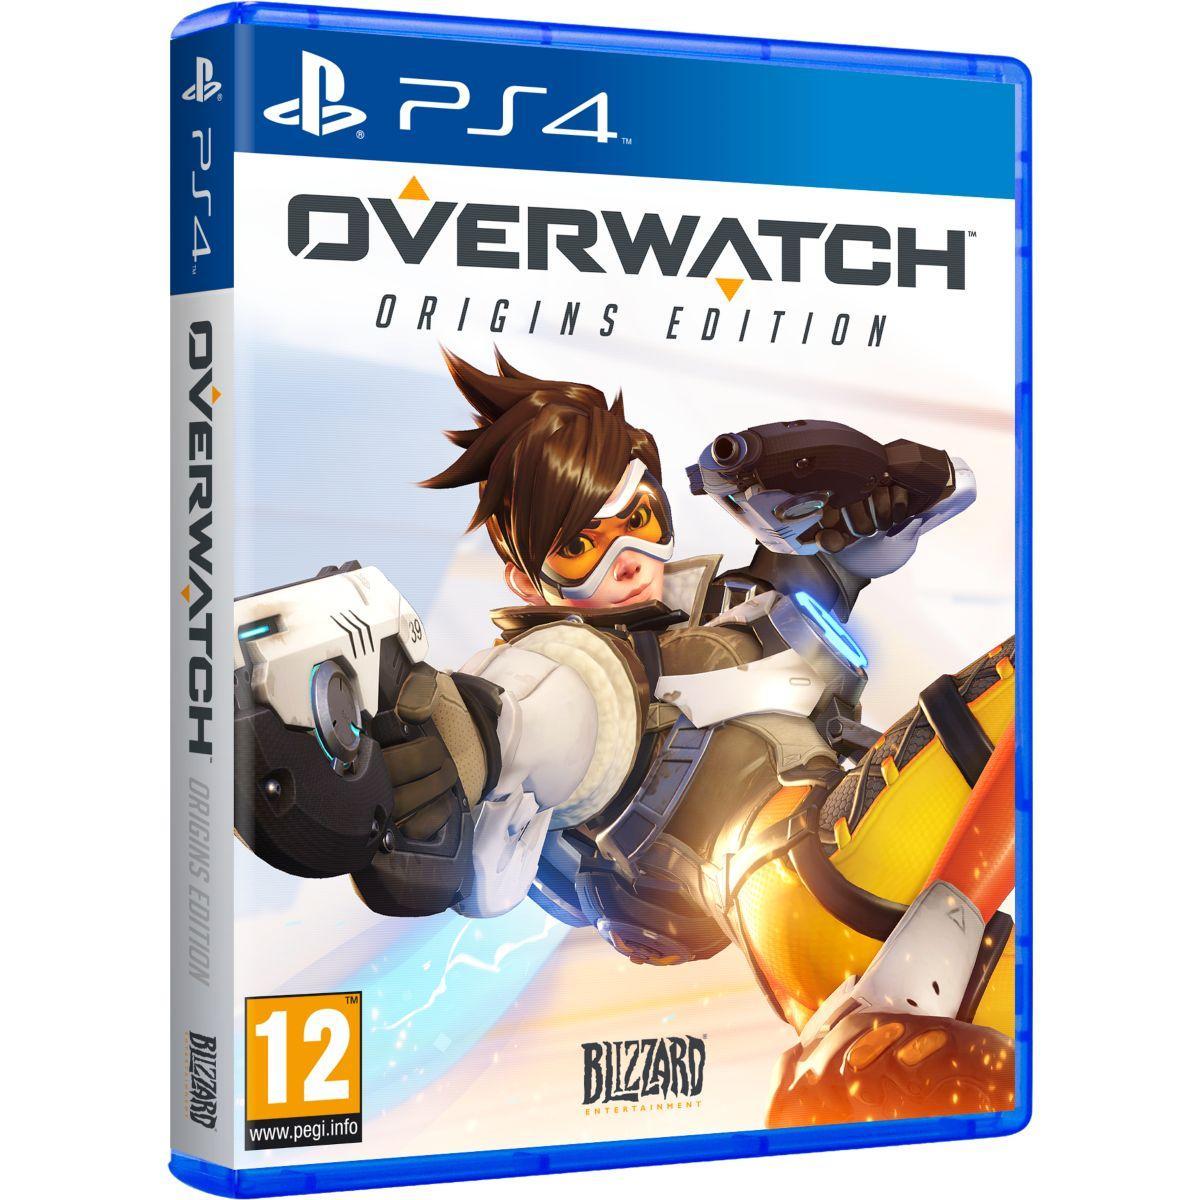 Jeu ps4 activision overwatch origins edition (photo)